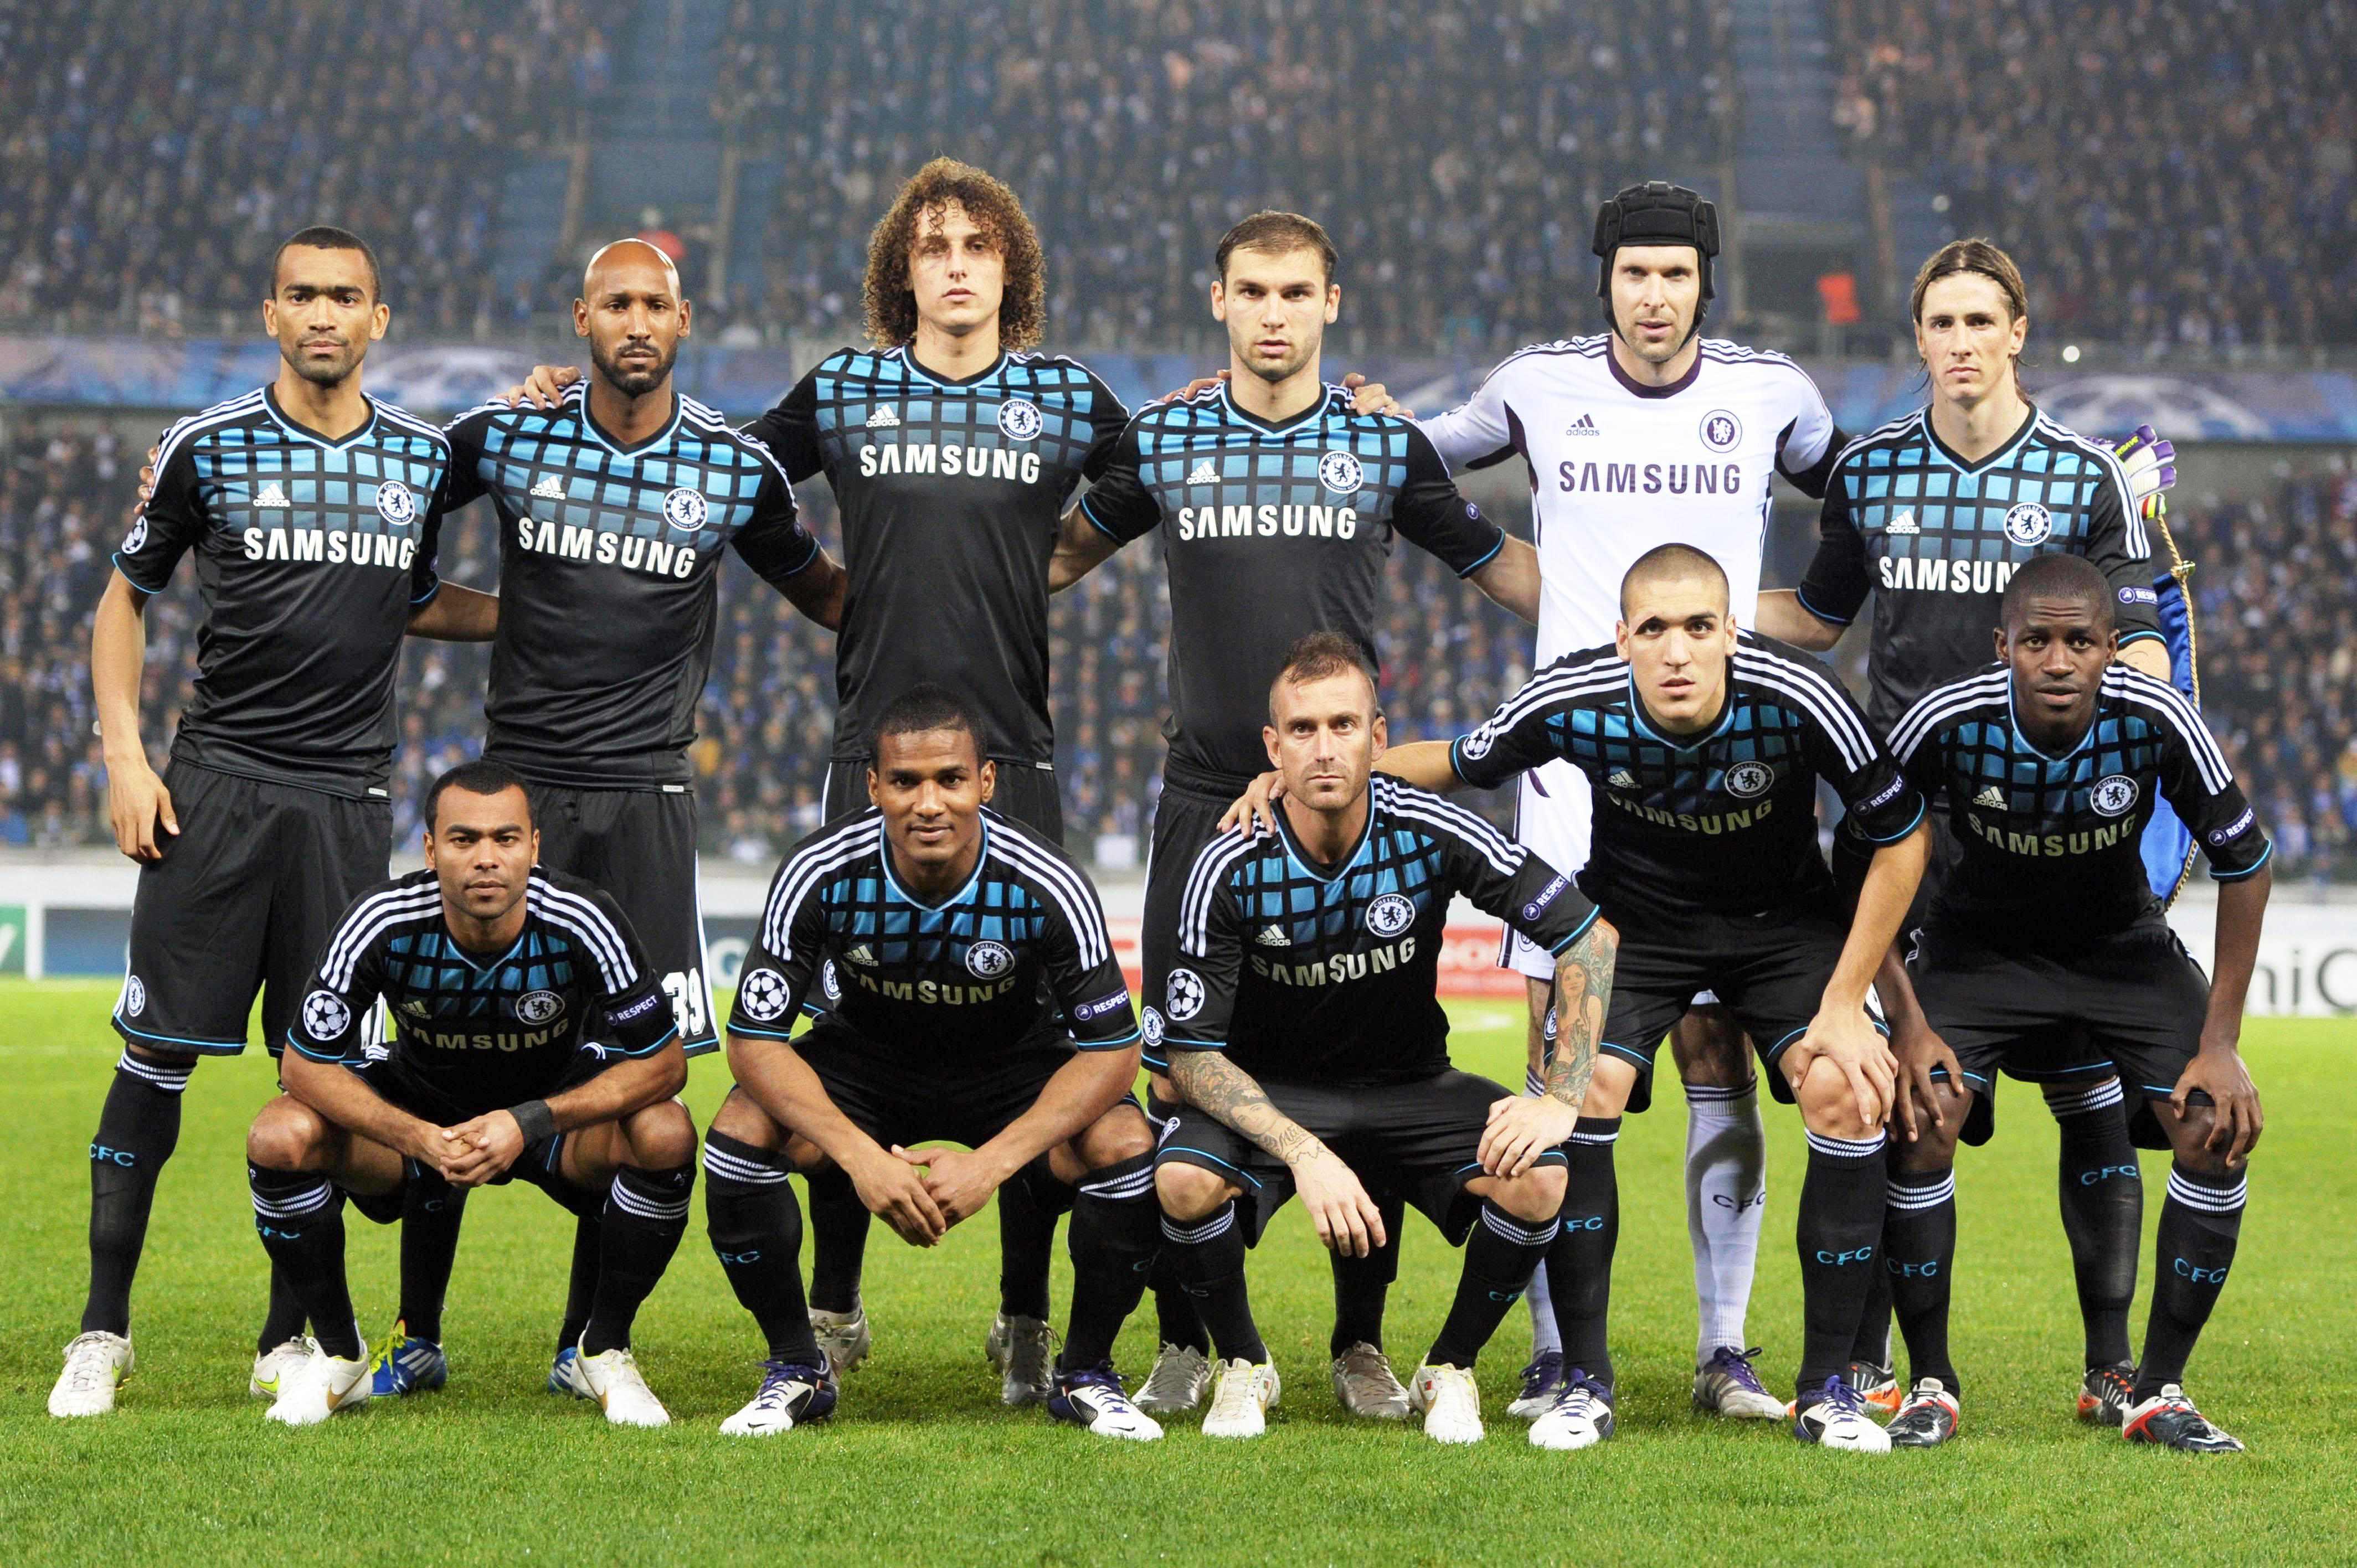 Chelsea F.C. Team Squad Wallpapers - Wallpaper Cave